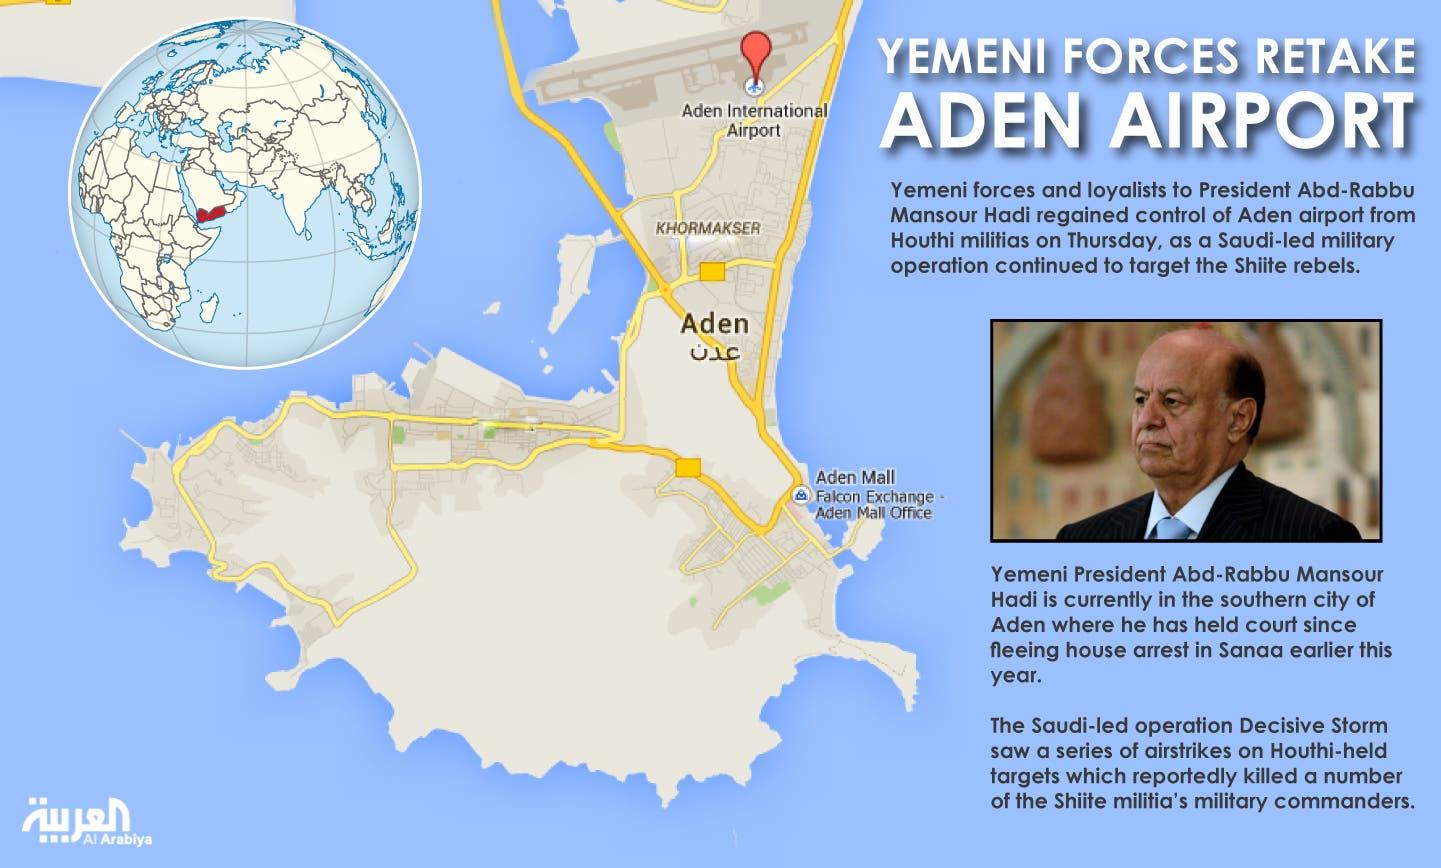 Infographic: Yemeni forces retake Aden airport